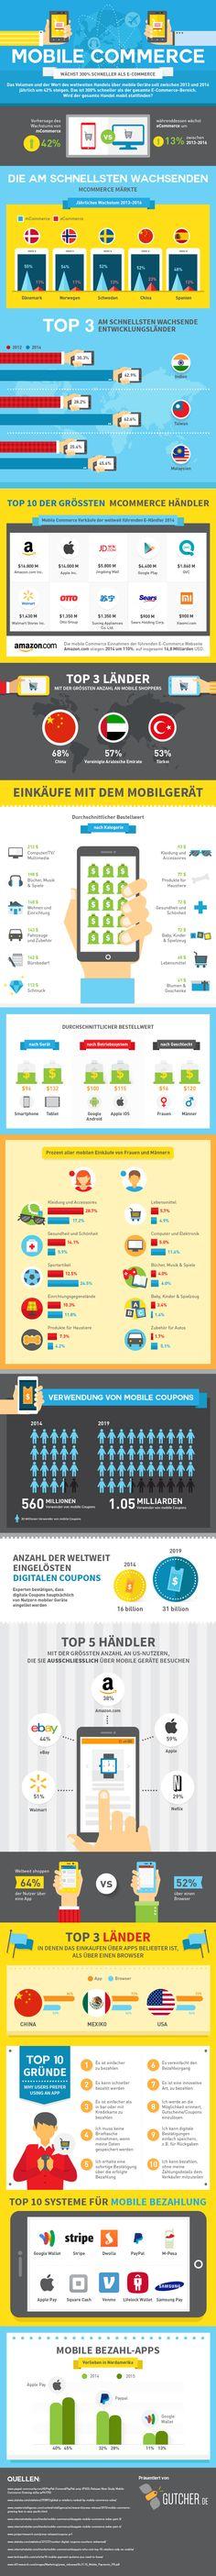 Infografik:+Der+weltweite+Mobile+Commerce+in+Zahlen.